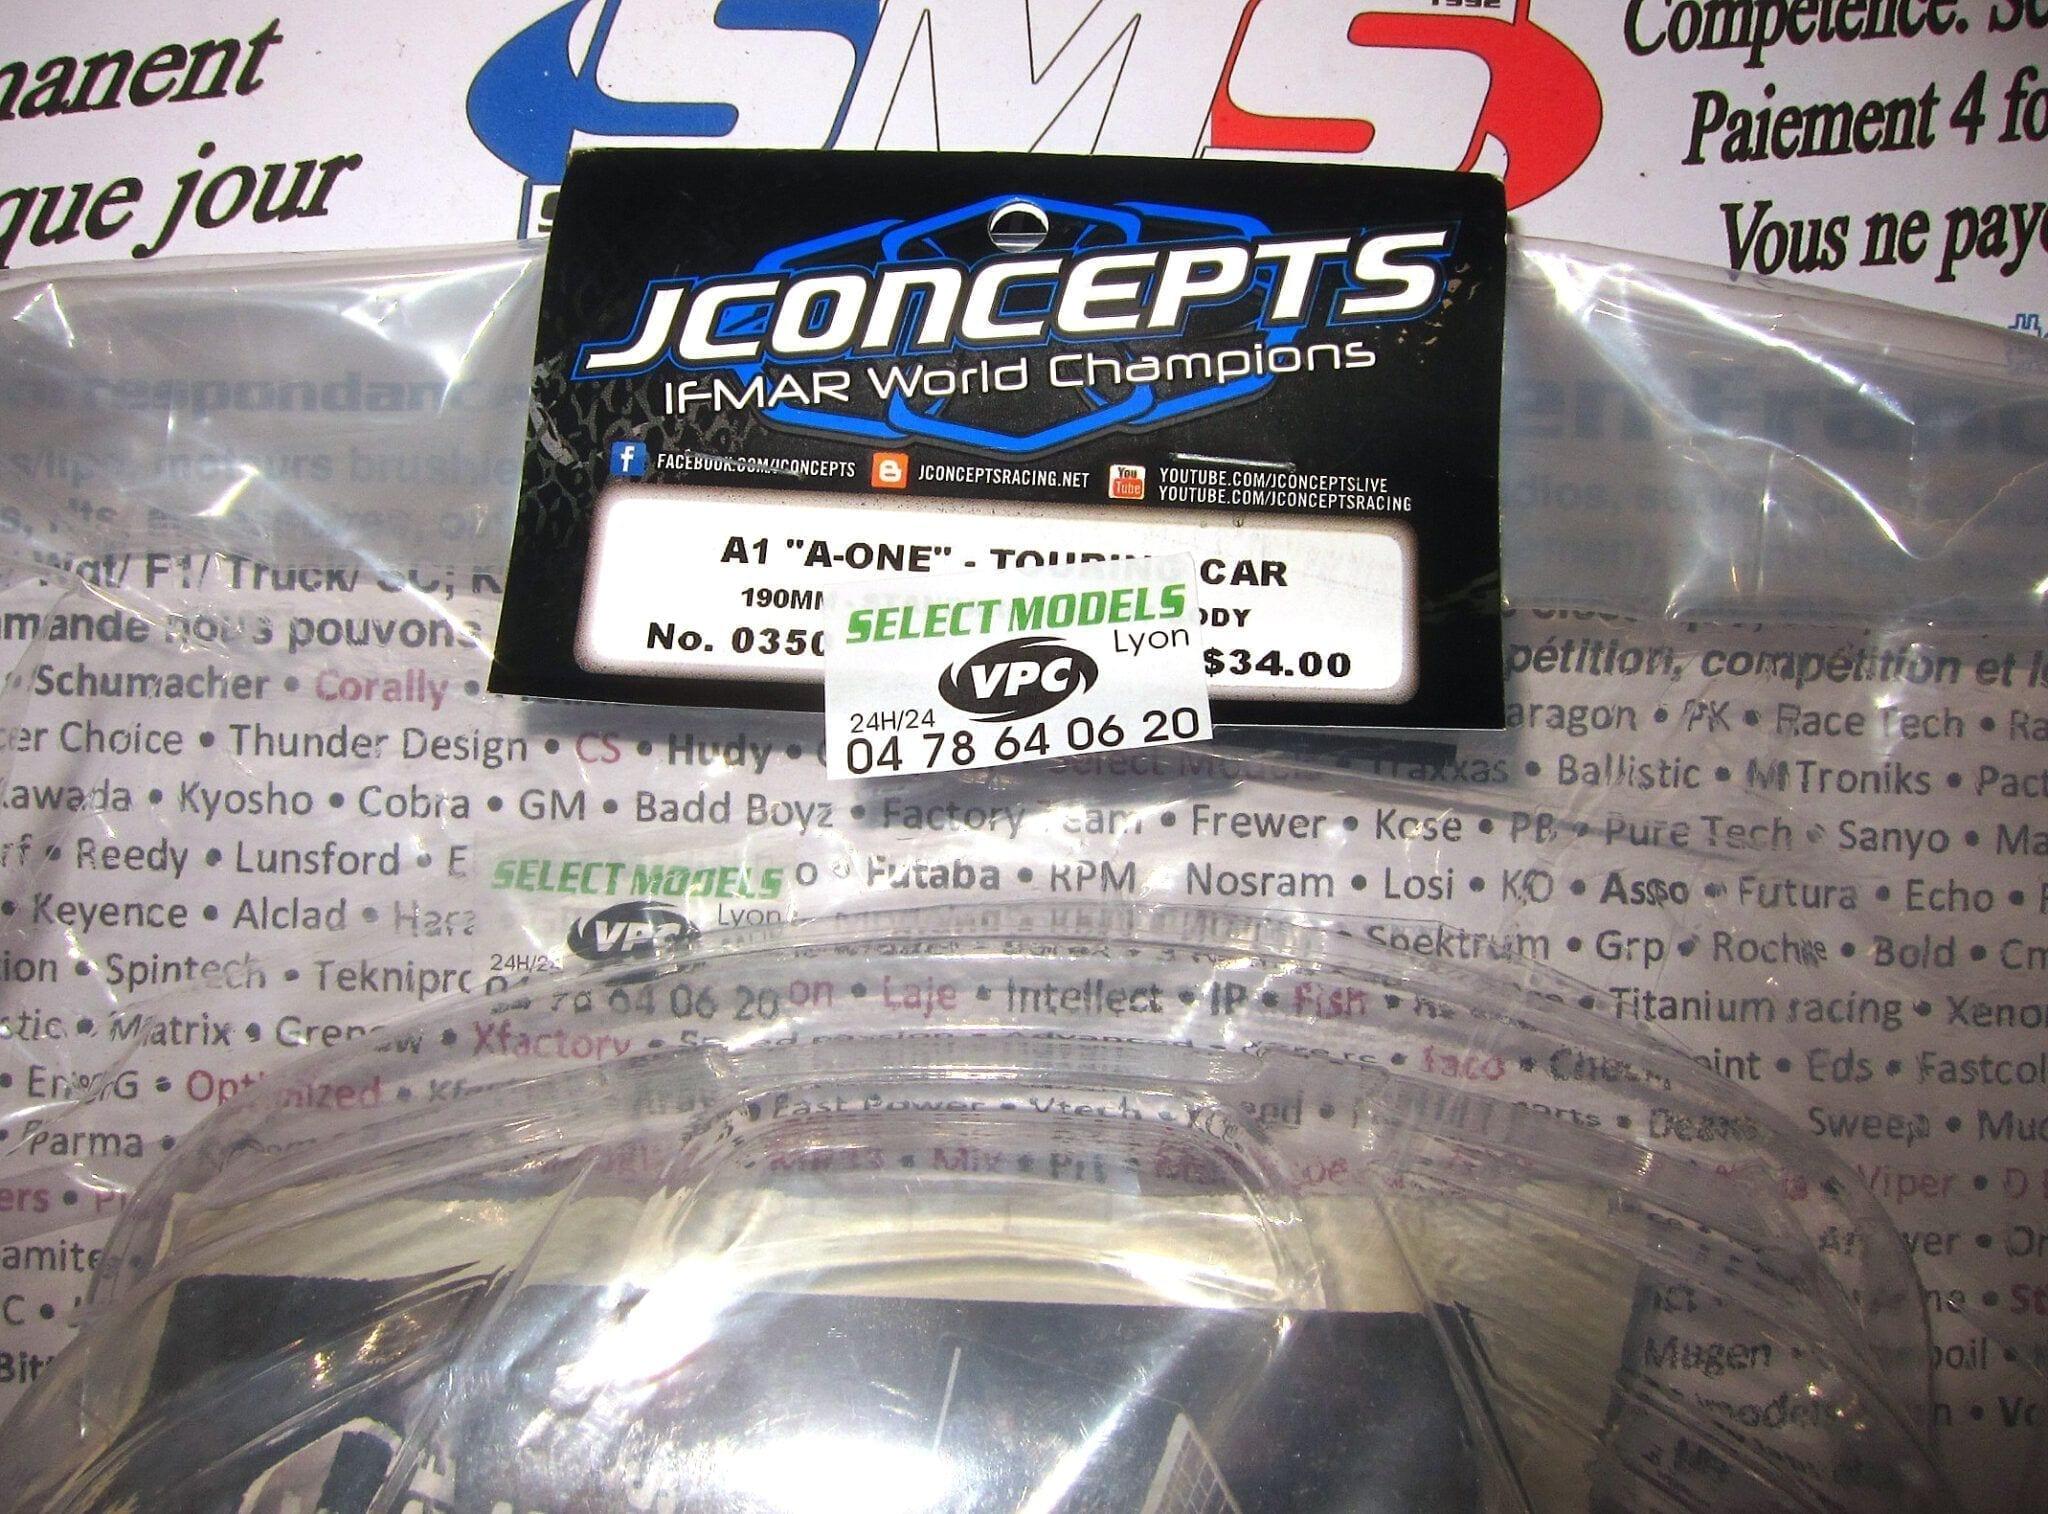 Jconcepts A-one 190mm